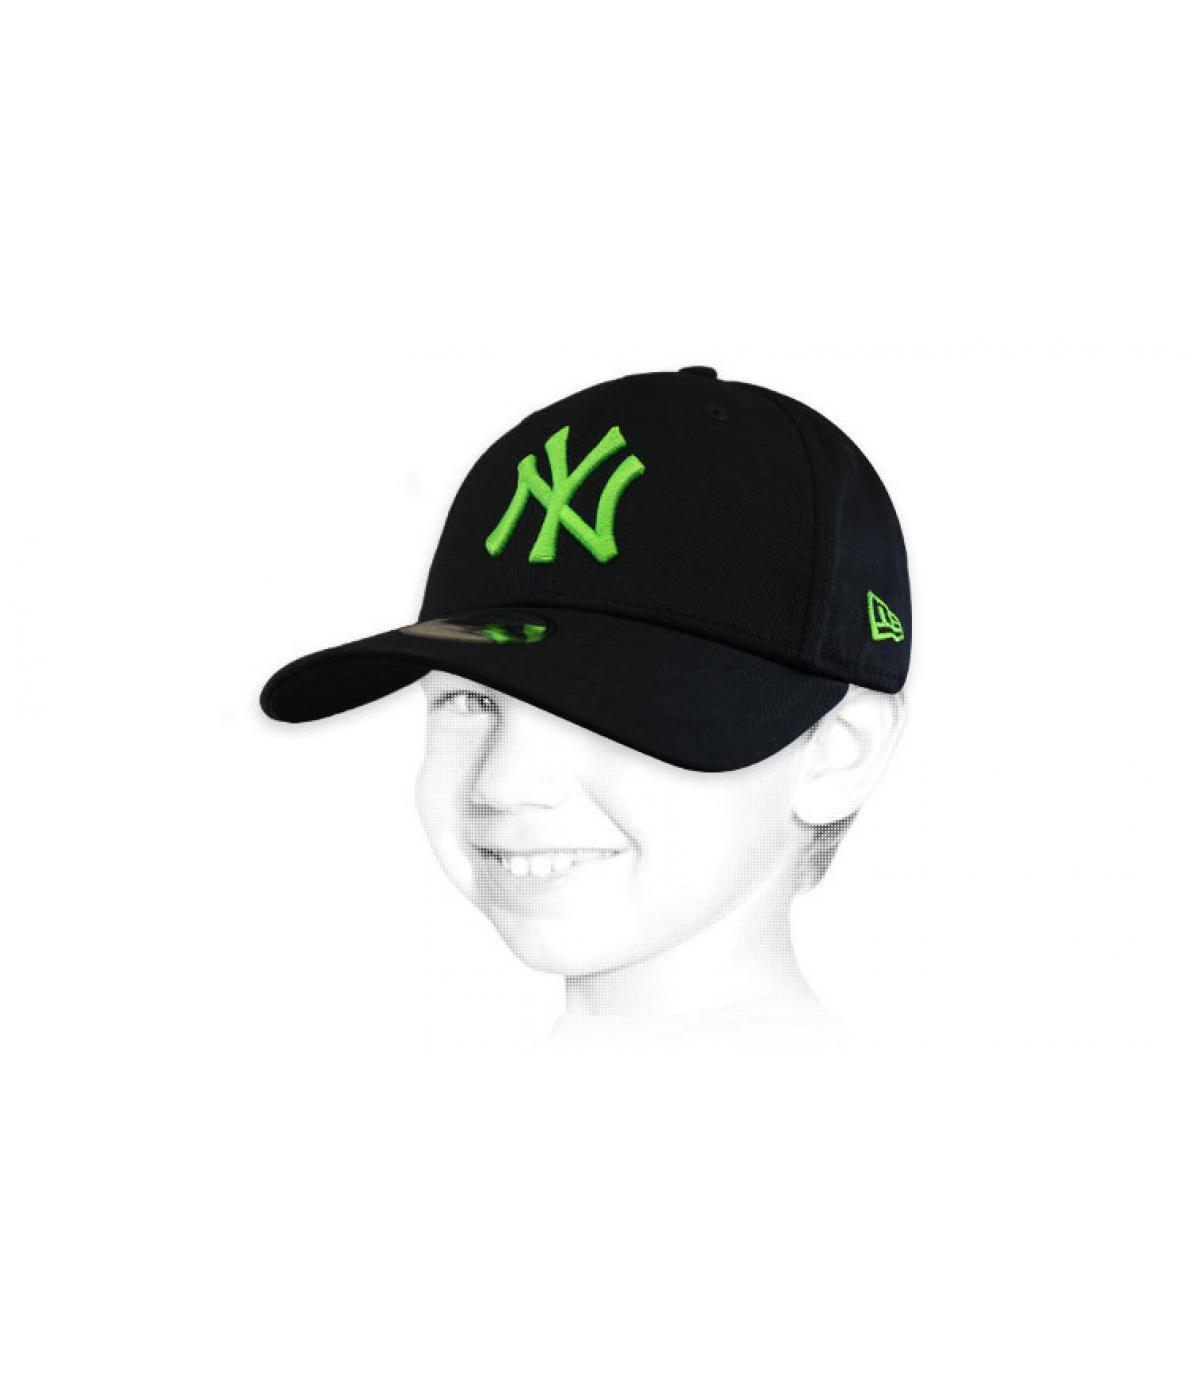 casquette NY enfant noir vert